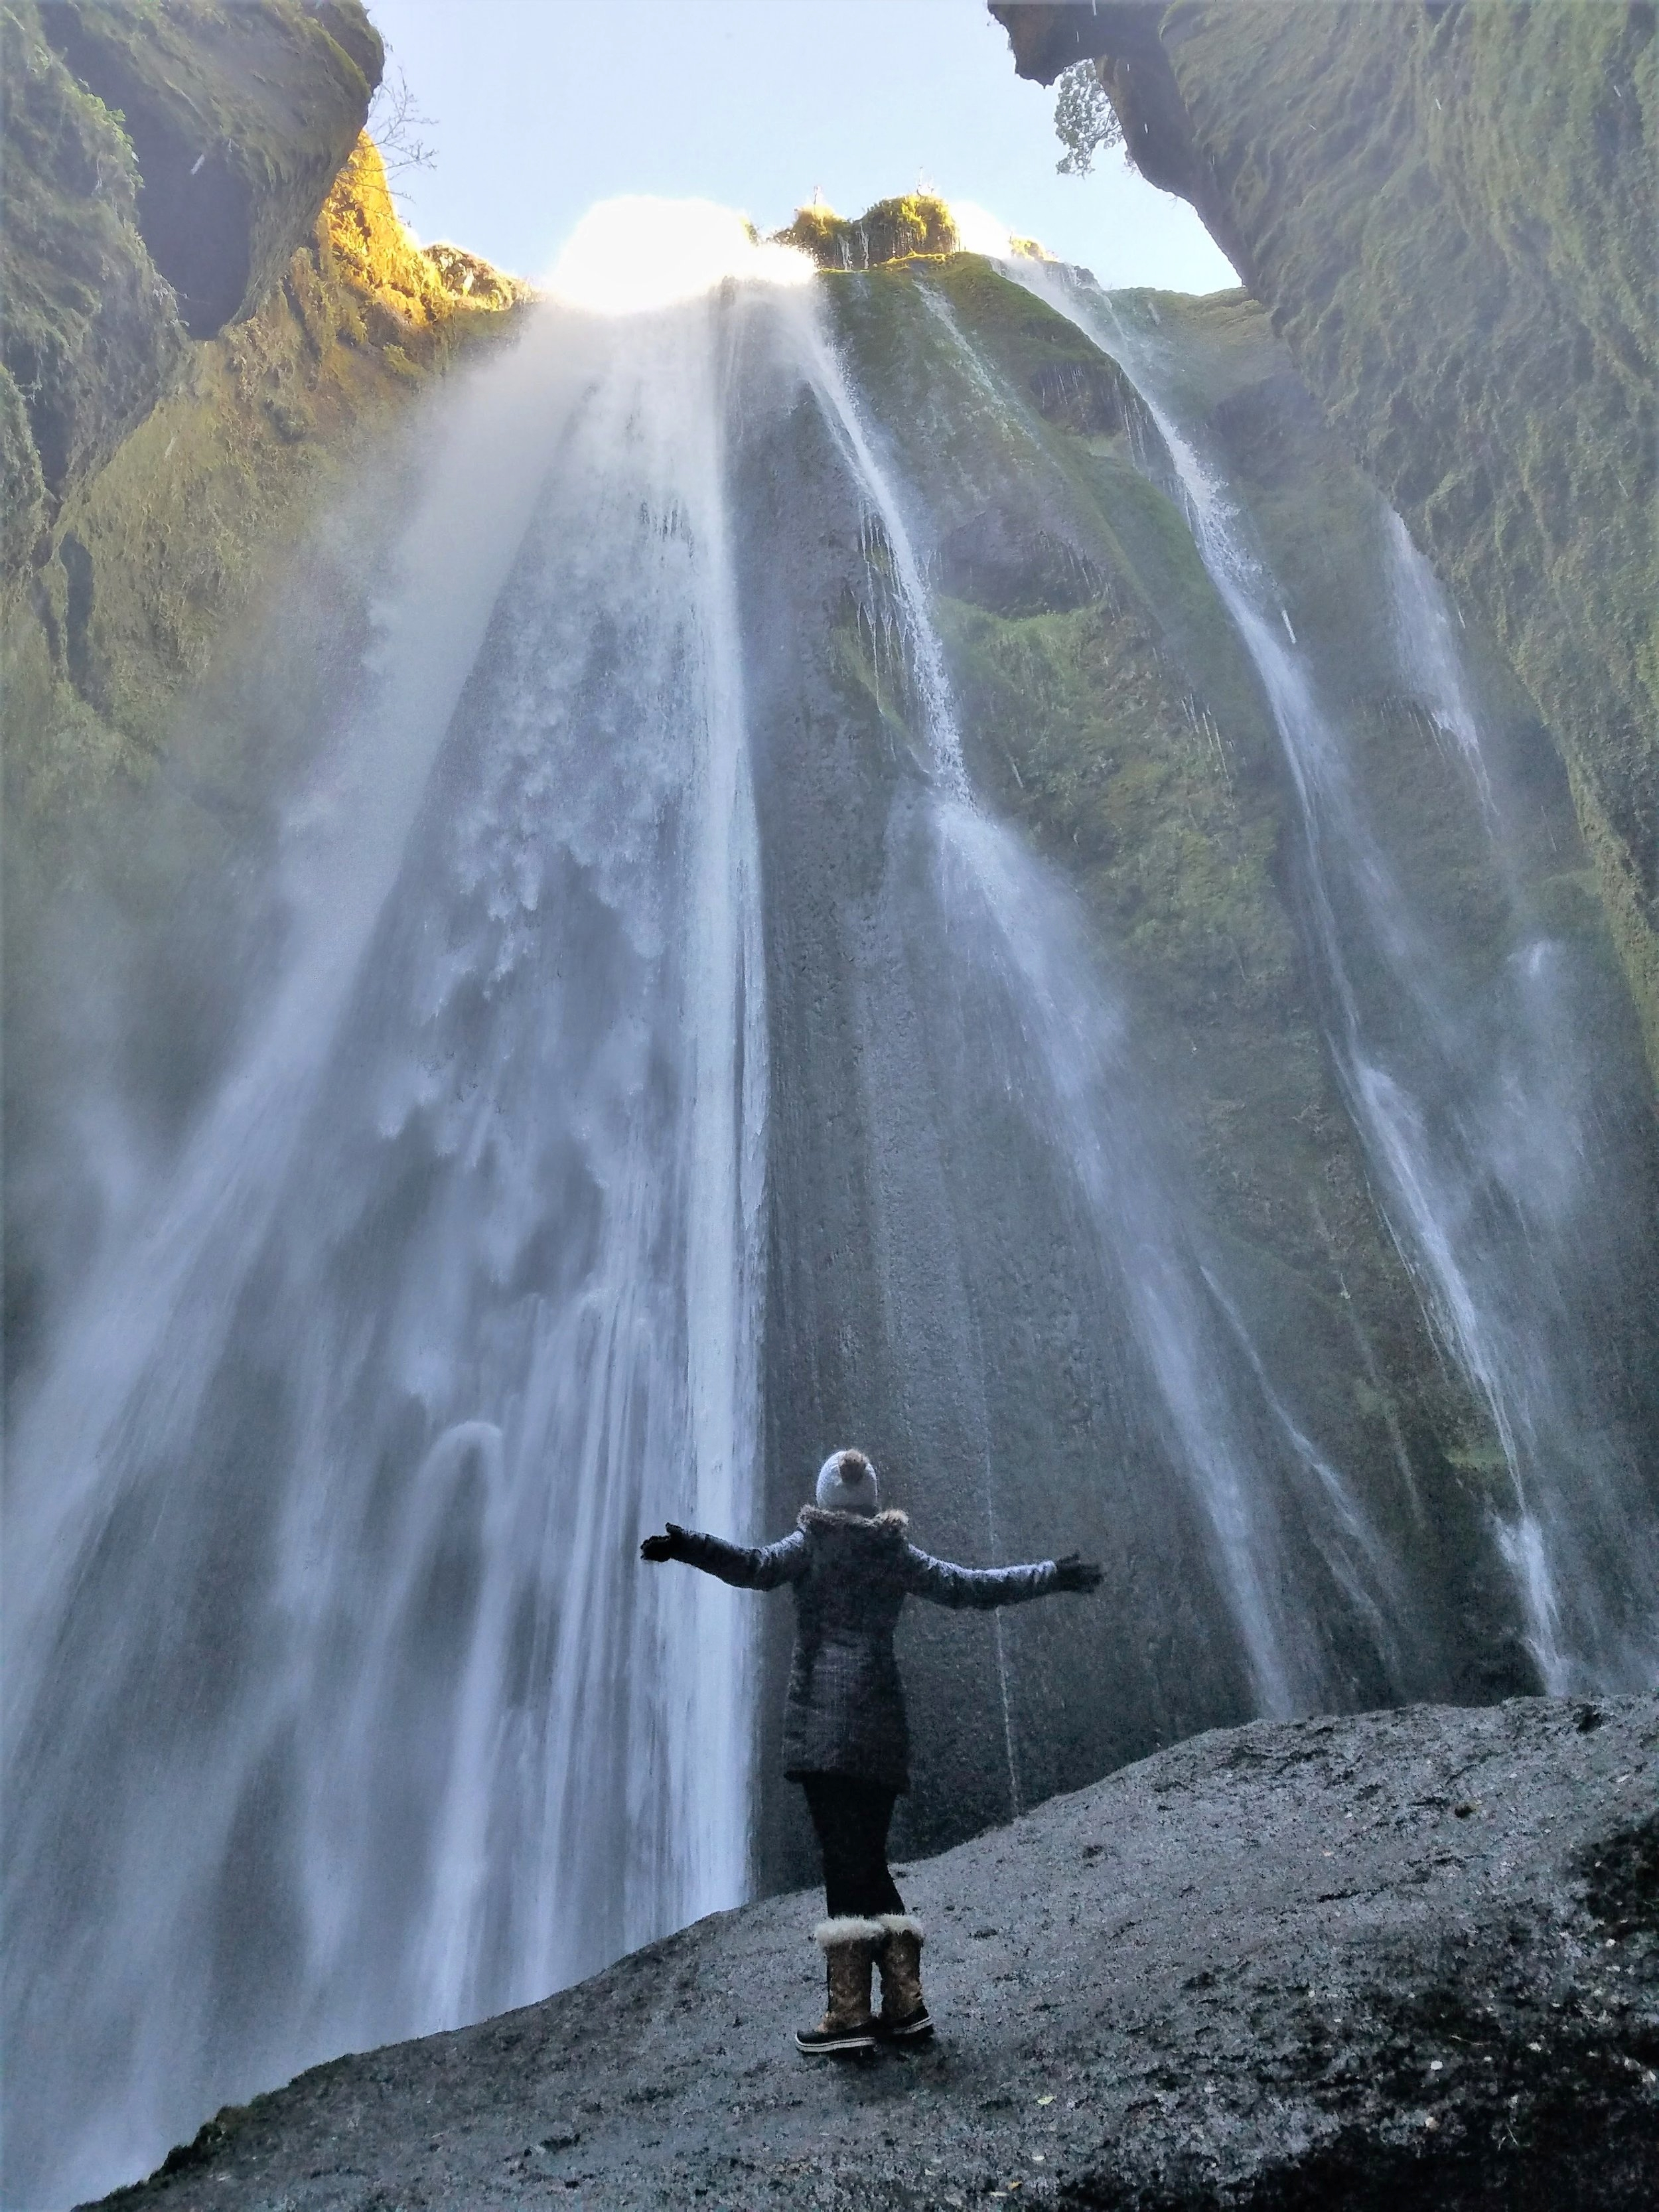 The secret Gljufrabui waterfall is one of the prettiest Iceland waterfalls. It is located near the popular Seljalandsfoss but hidden by cliffs. #travel #iceland #icelandtravel #wanderlust #europe #waterfalls #naturepics #icelandwaterfalls #waterfallsaroundtheworld #traveldestinations #traveltips